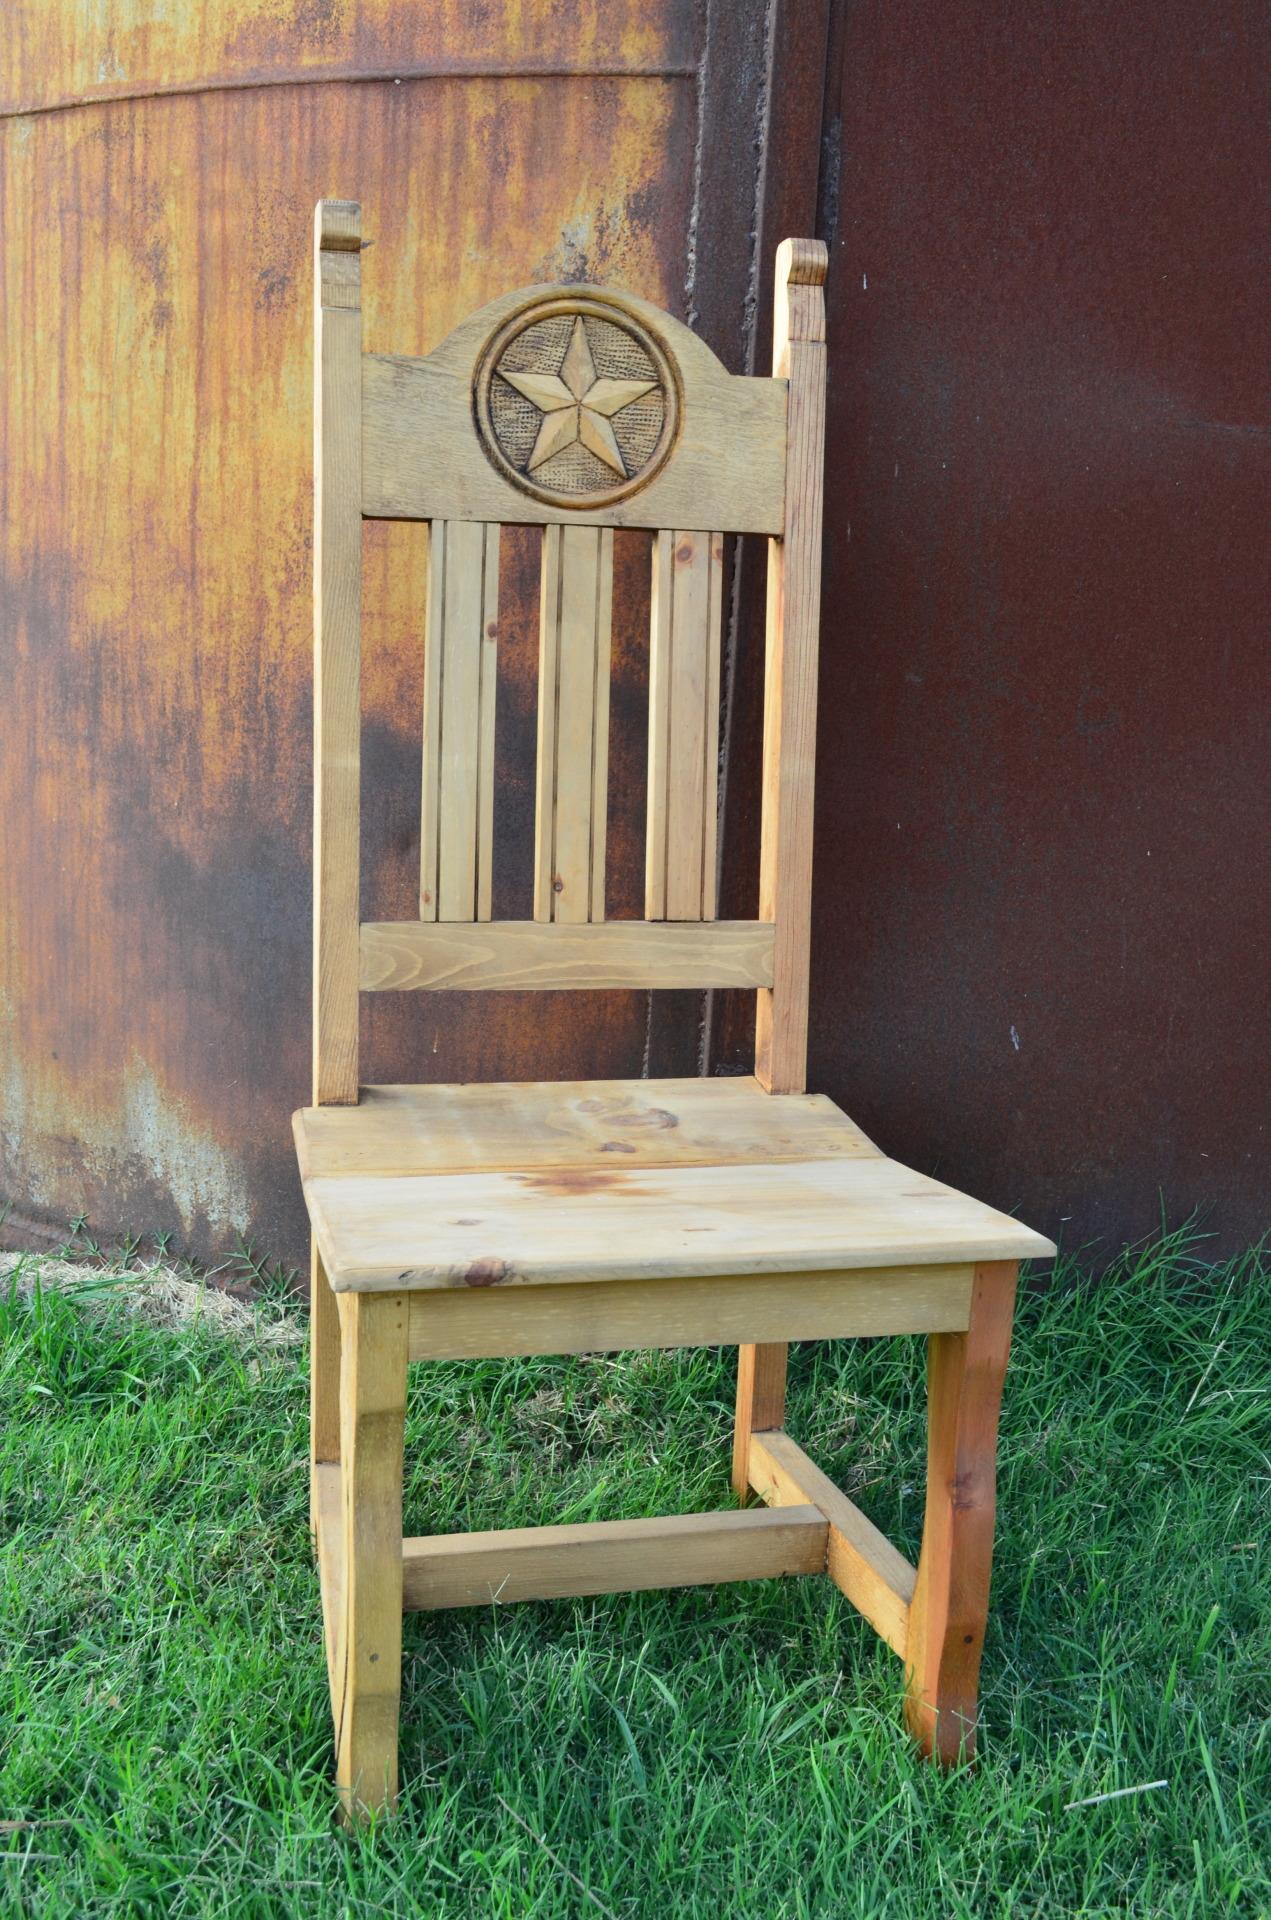 Texas Star Wooden Chair $138